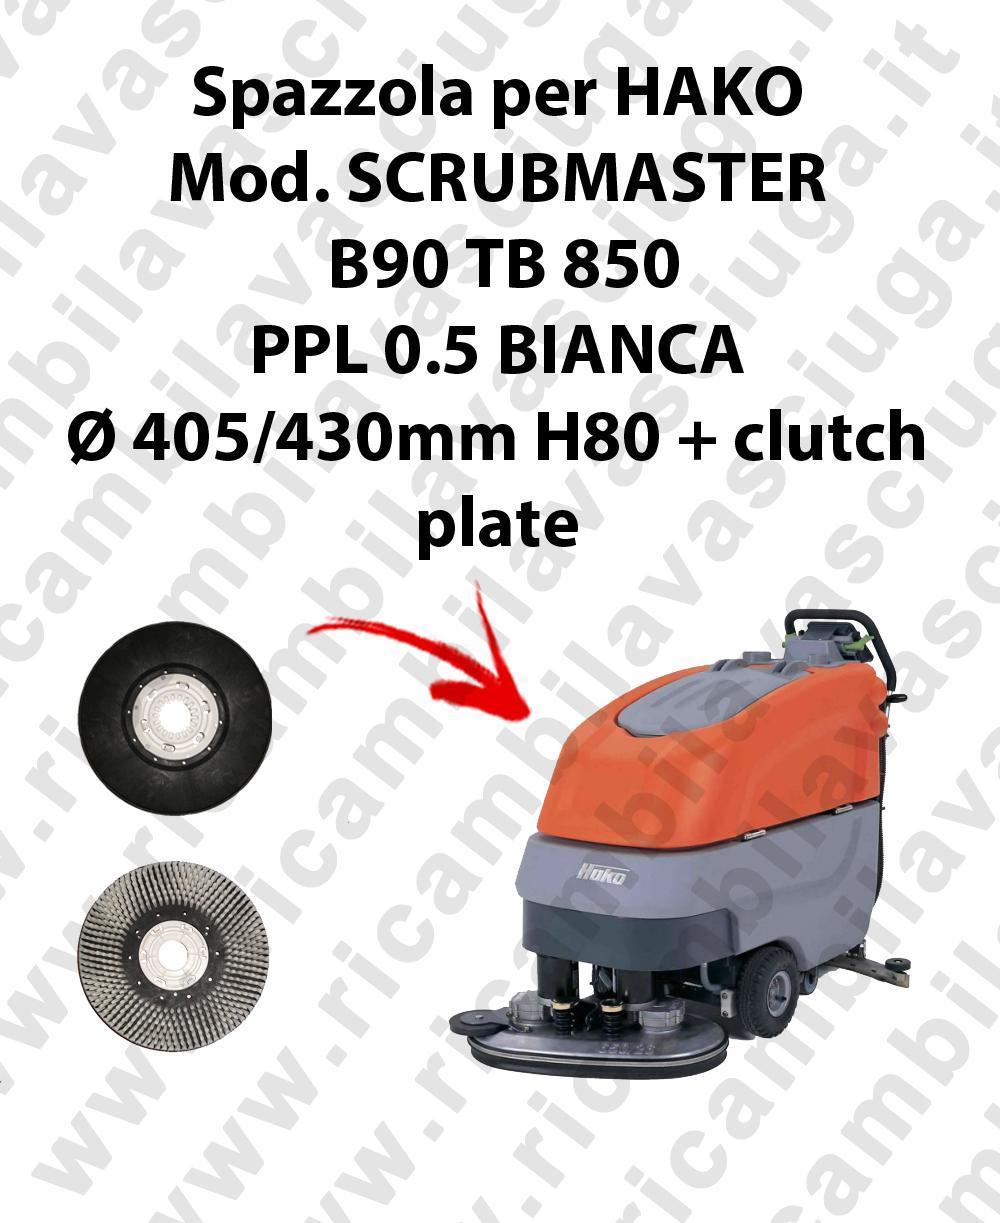 BROSSE A LAVER pour autolaveuses HAKO Reference SCRUBMASTER B90 TB 850